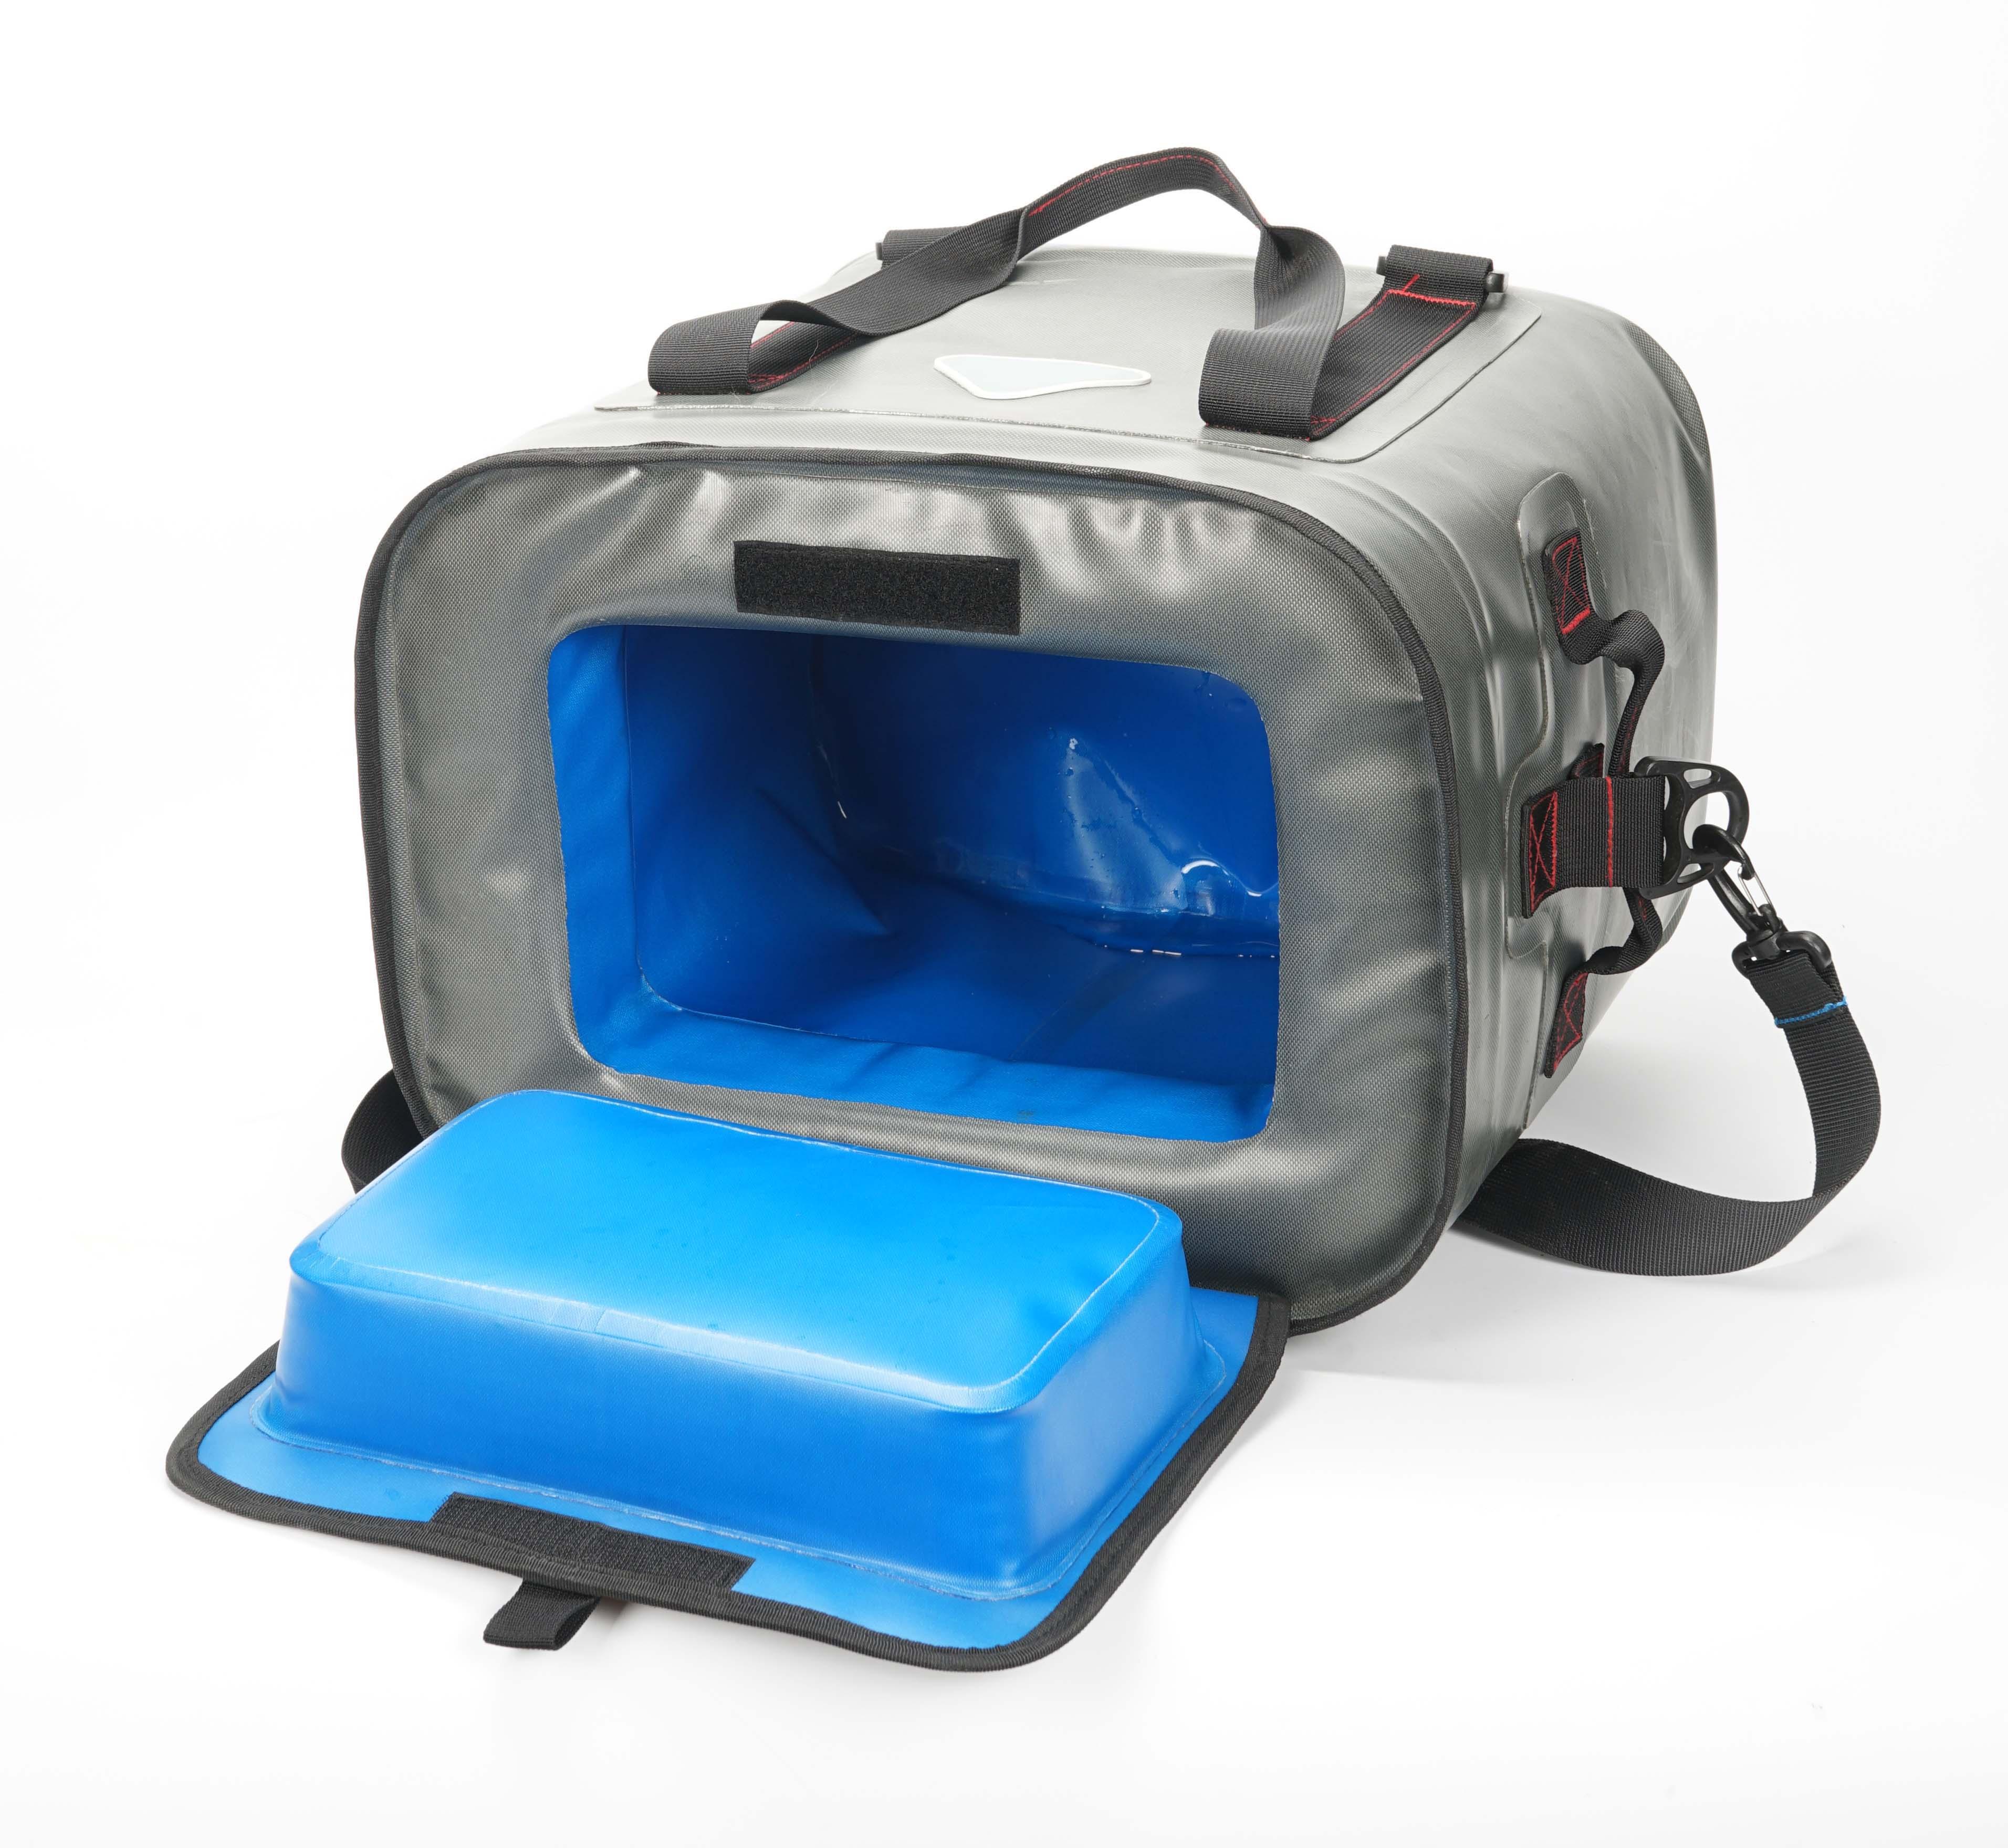 BG-EV020CB Waterproof Soft Sided Insulat